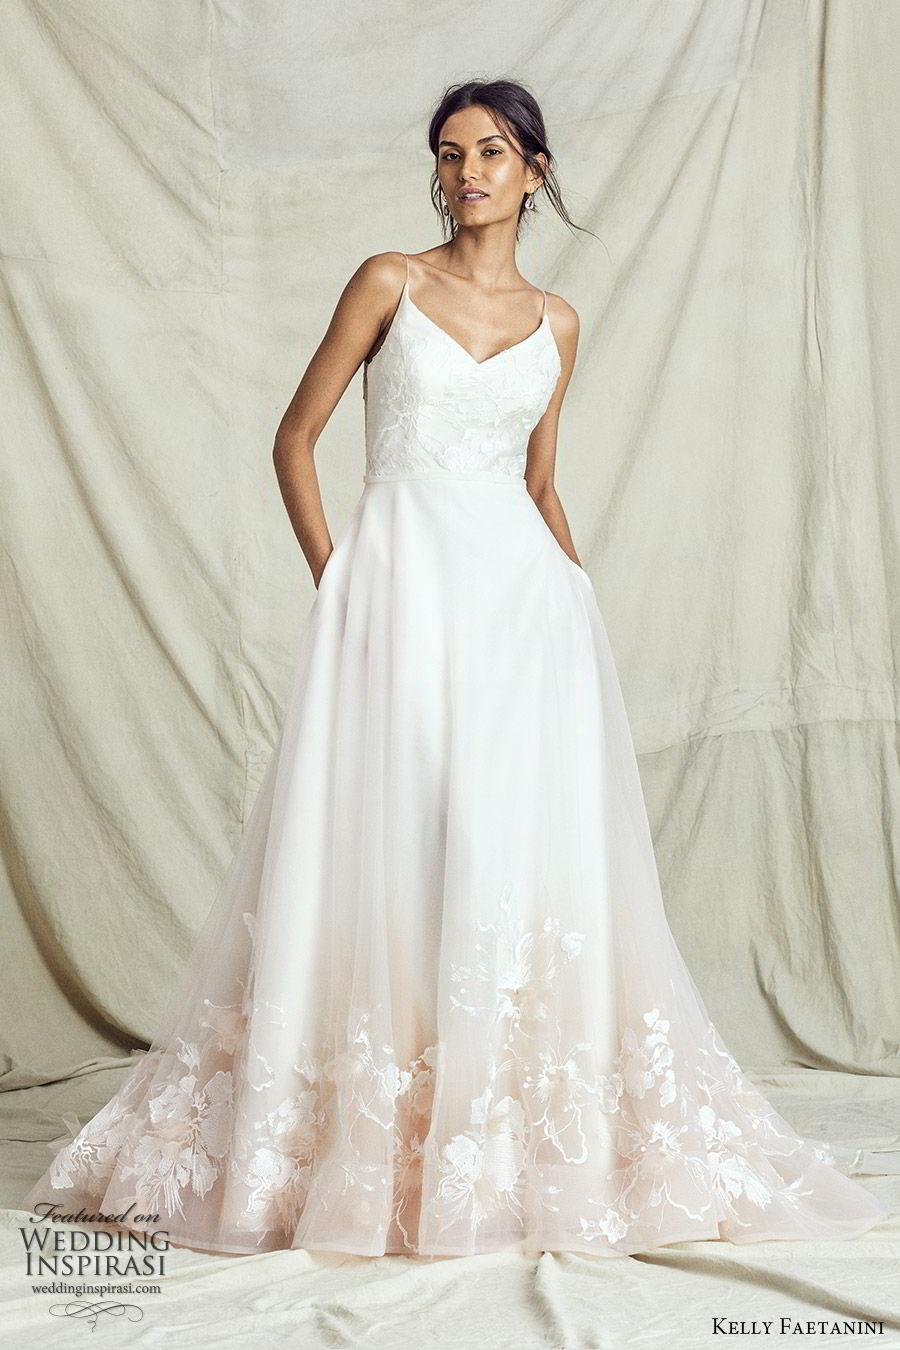 kelly faetanini fall 2019 bridal sleeveless thin straps sweetheart neckline embellished bodice a line ball gown wedding dress chapel train ombre blush romantic (6) mv